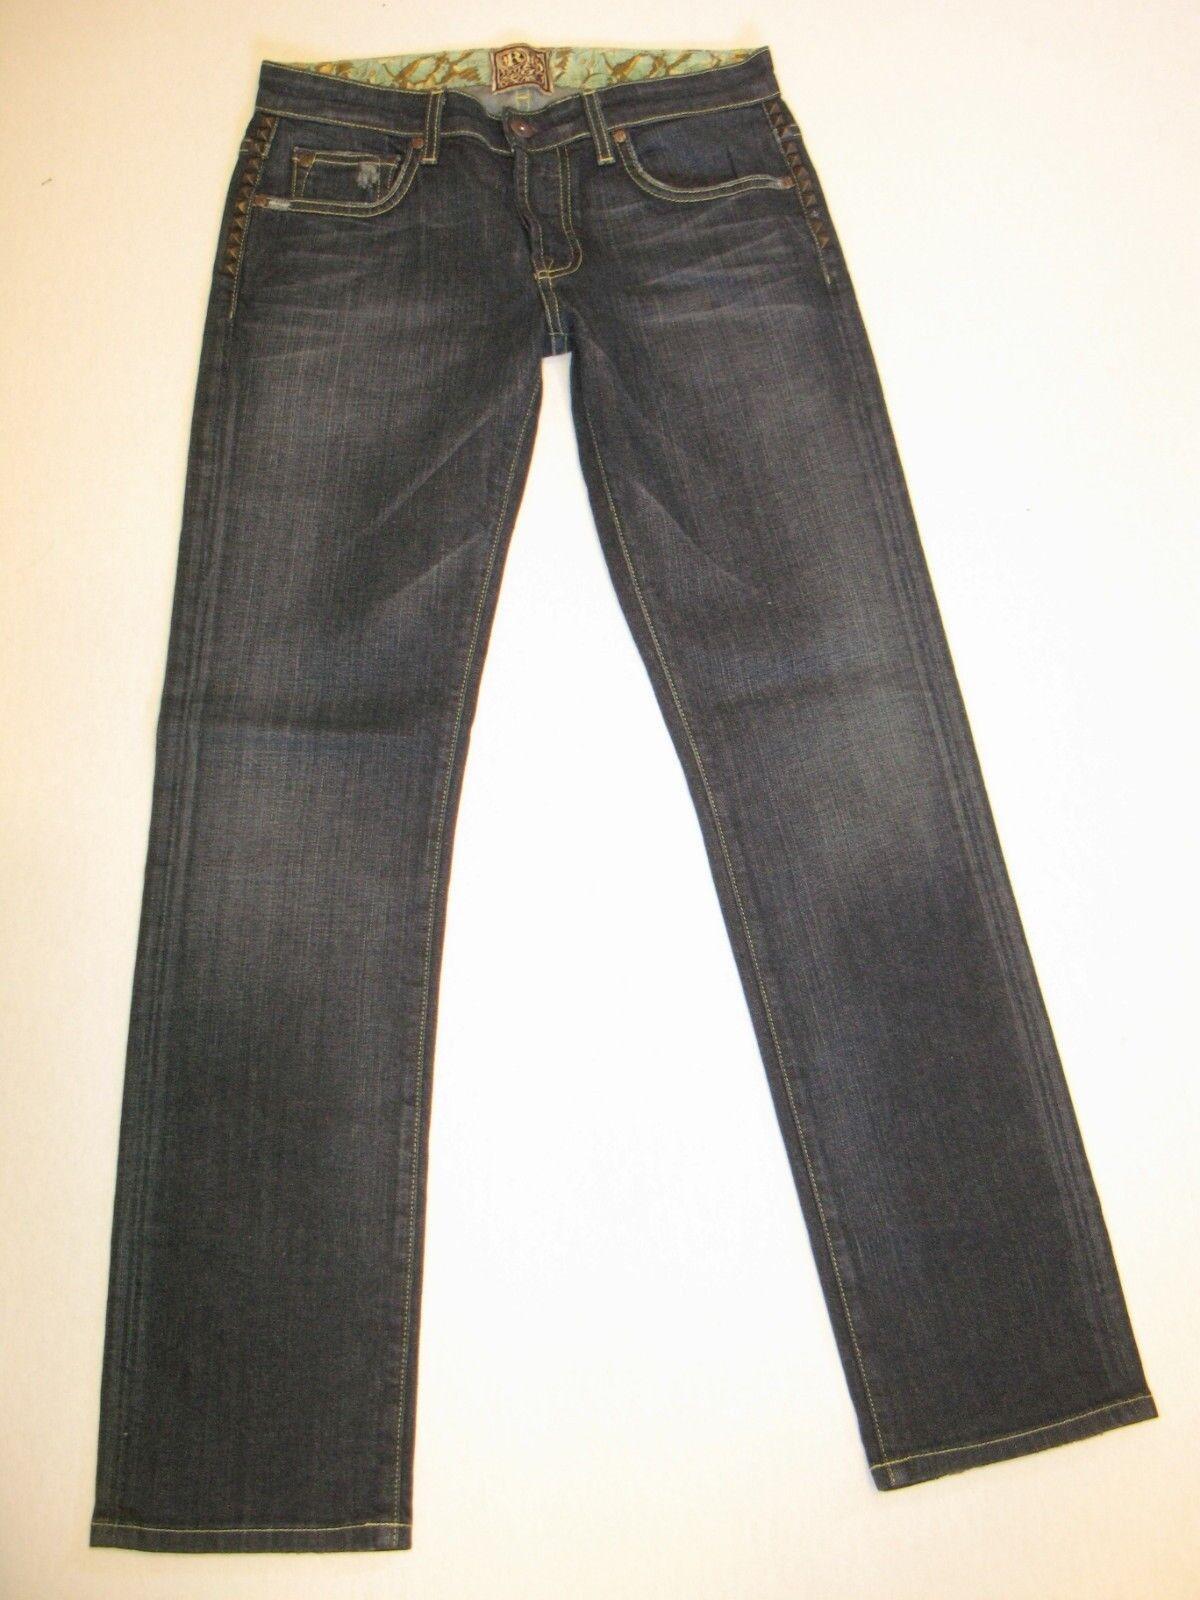 Rich & Skinny Jeans Womens Super Studly Straight Leg Sz 25 NEW (Run BIG)